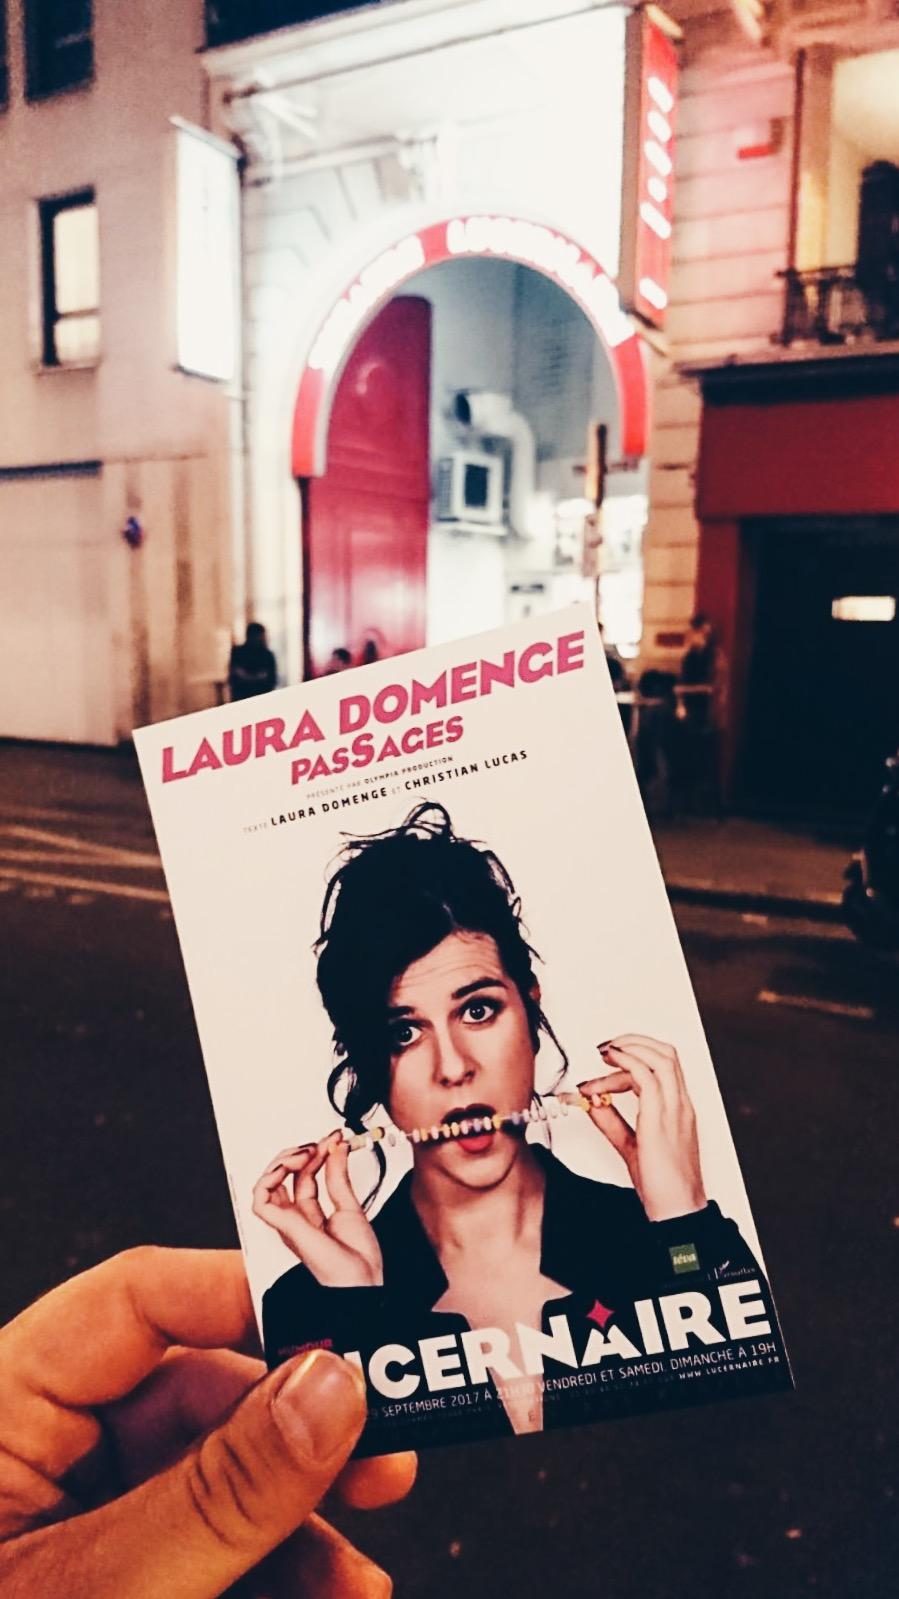 Laura Domenge